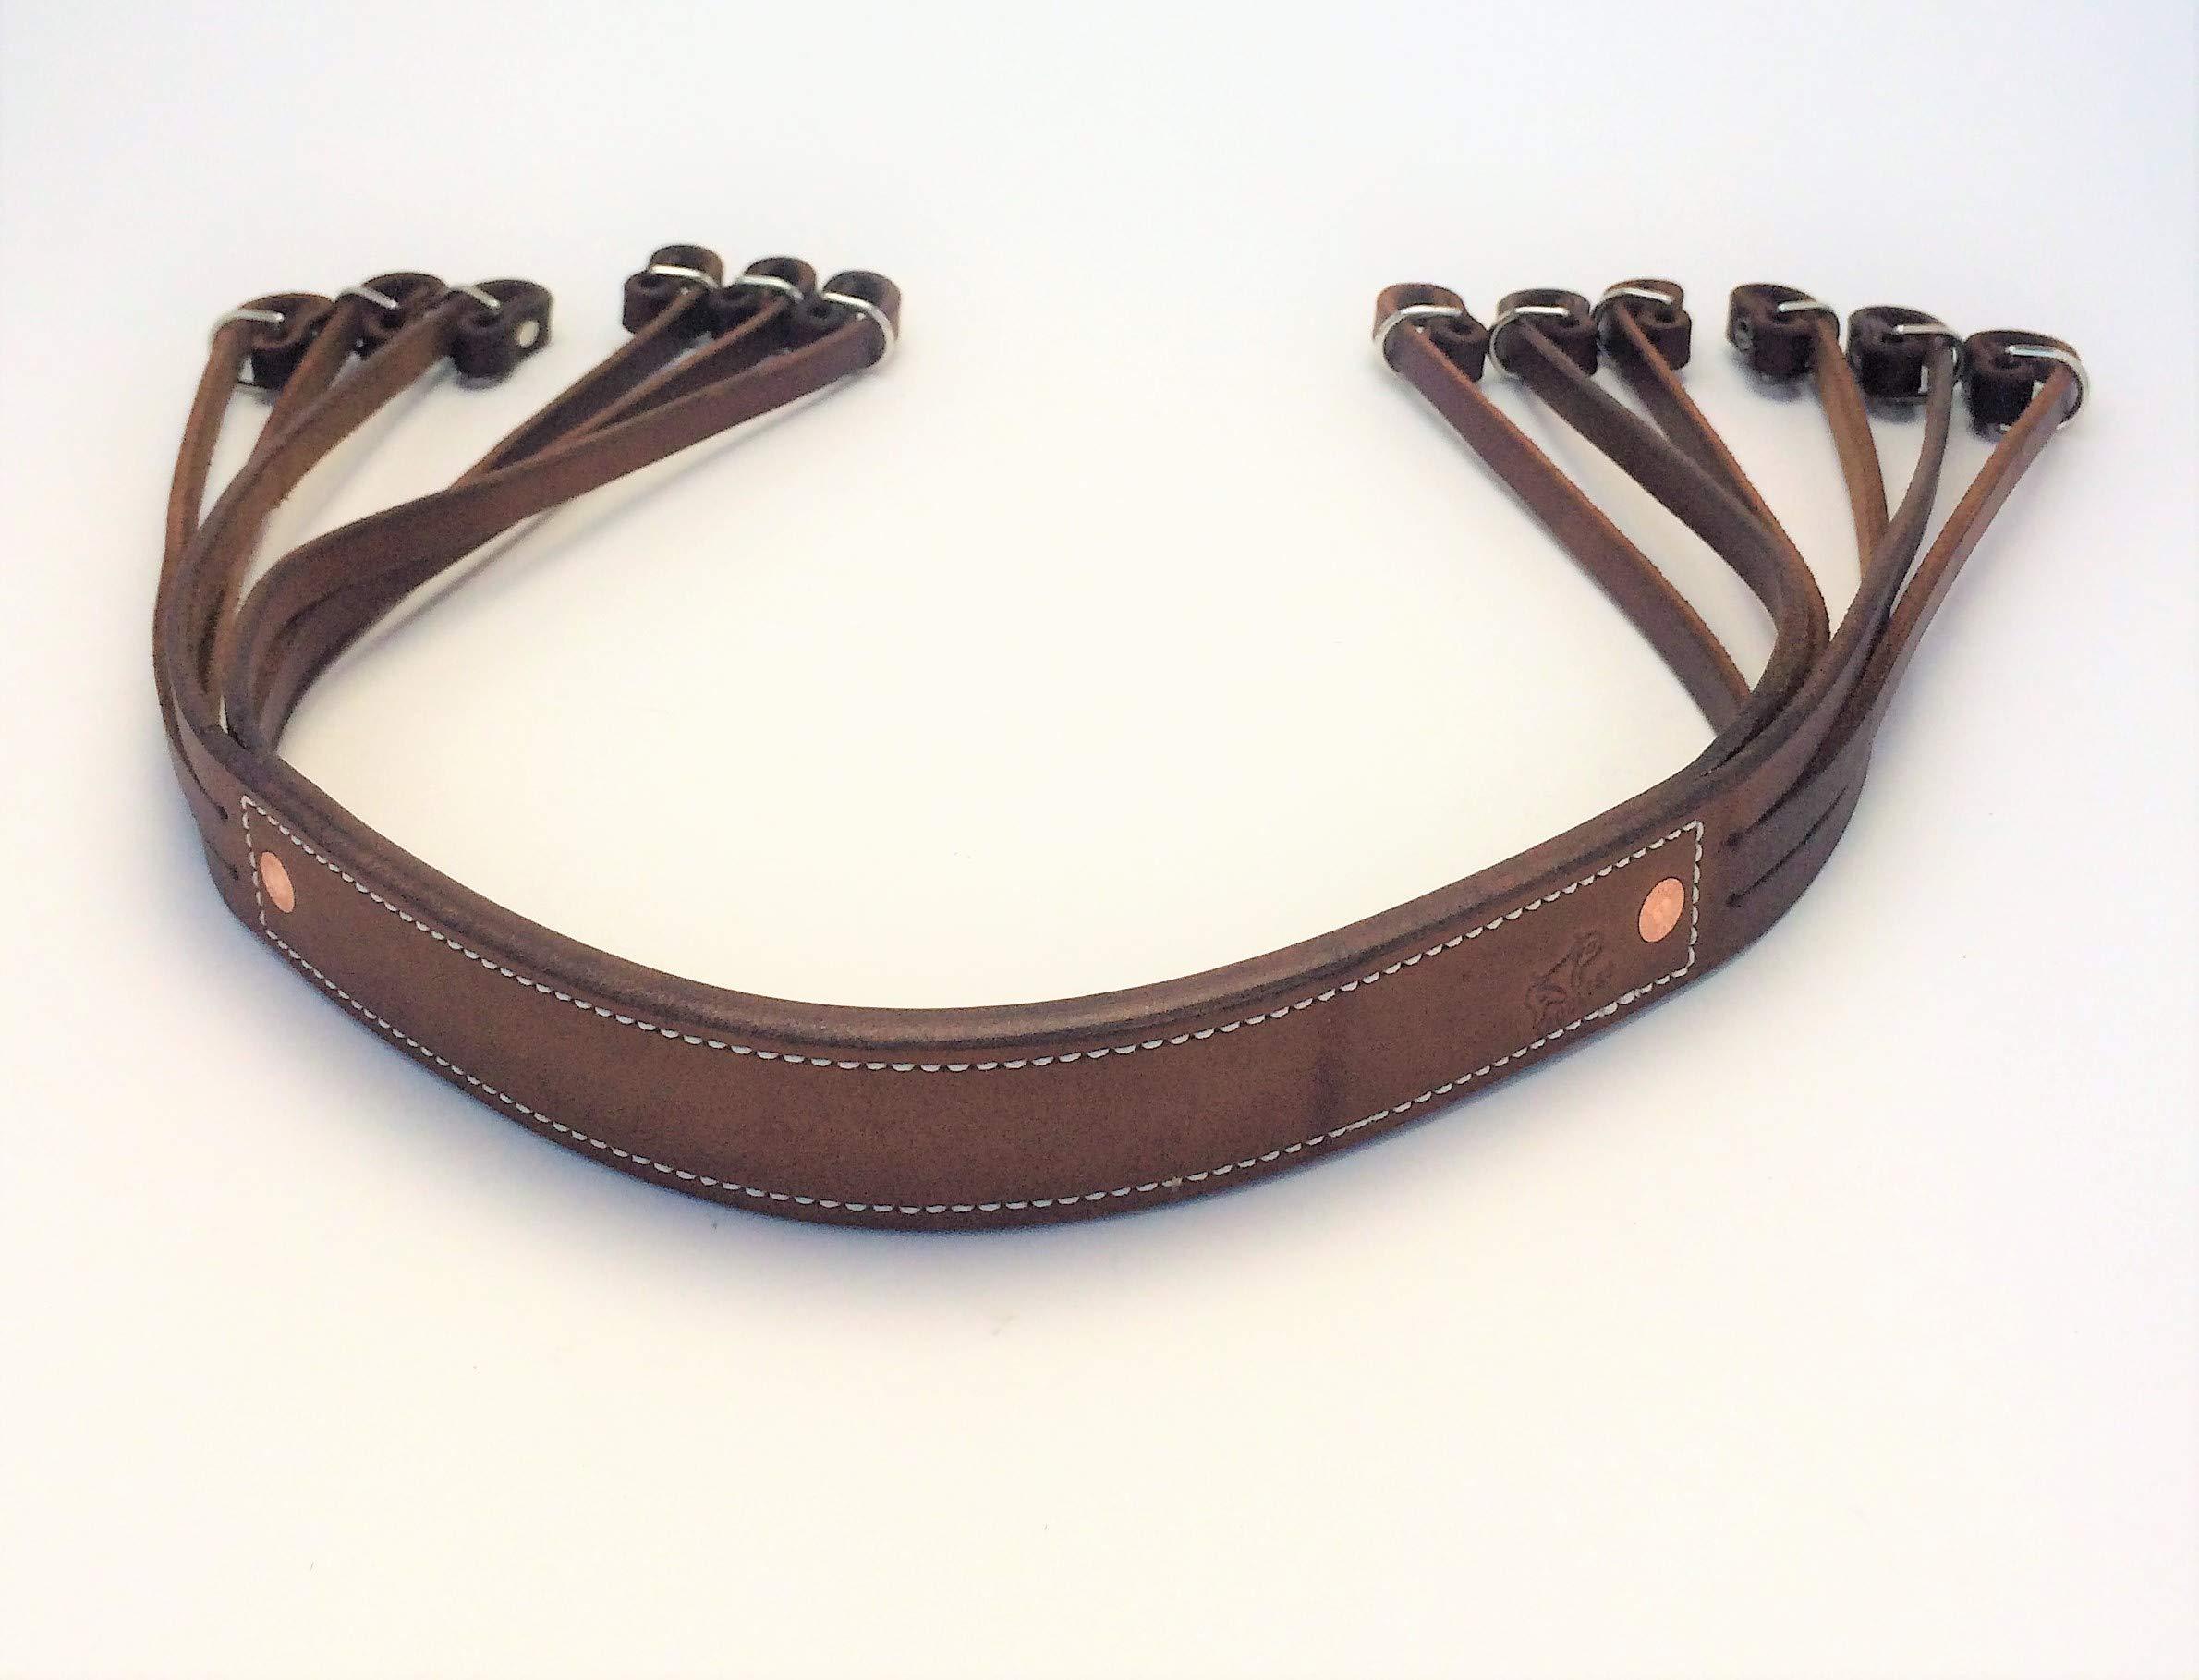 AP Saddlery Low Profile Leather Duck Strap (Dark Brown)